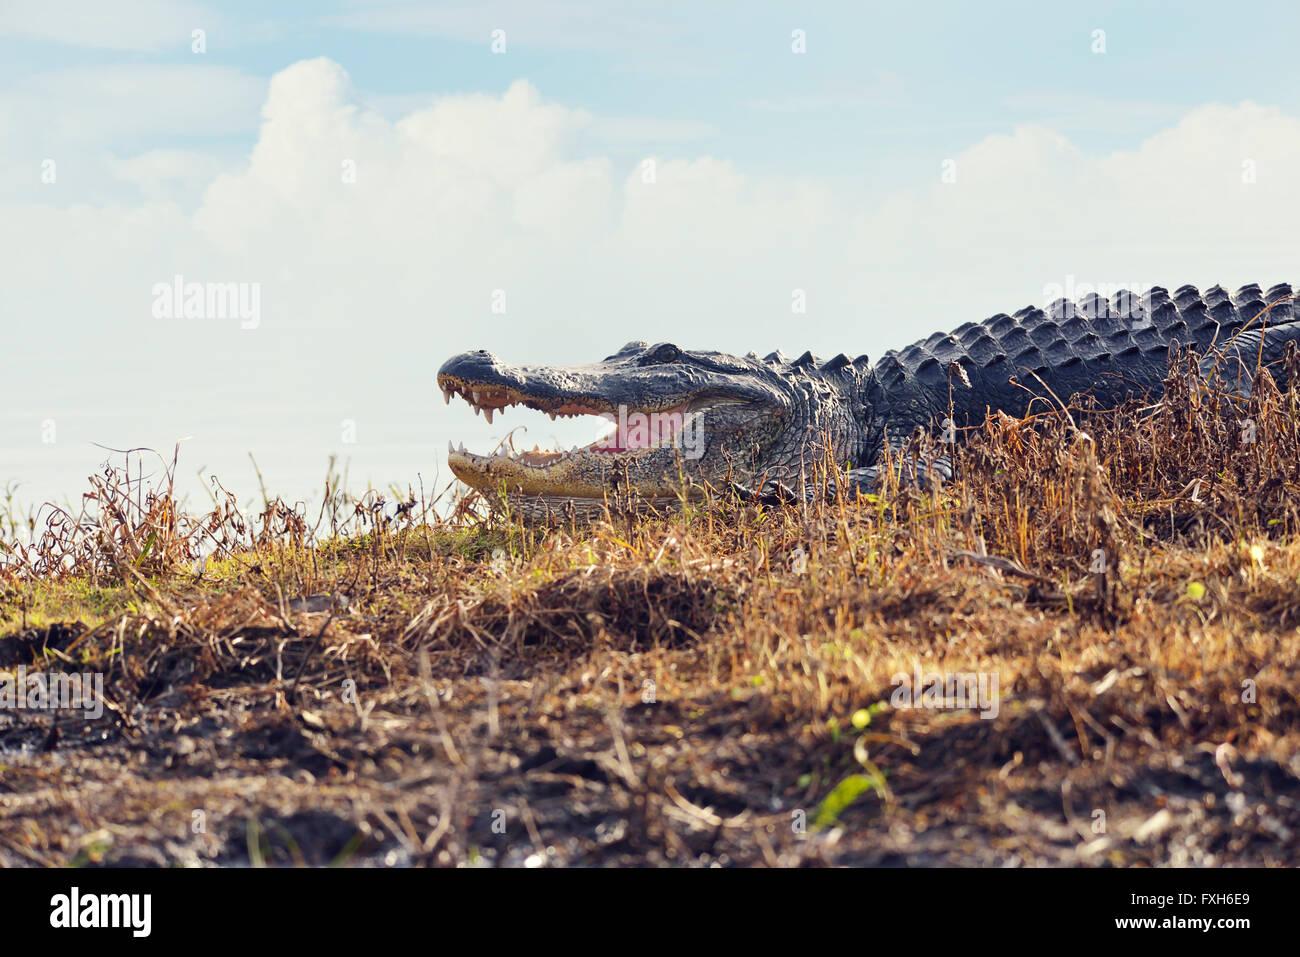 Gran Florida Alligator en humedales Imagen De Stock